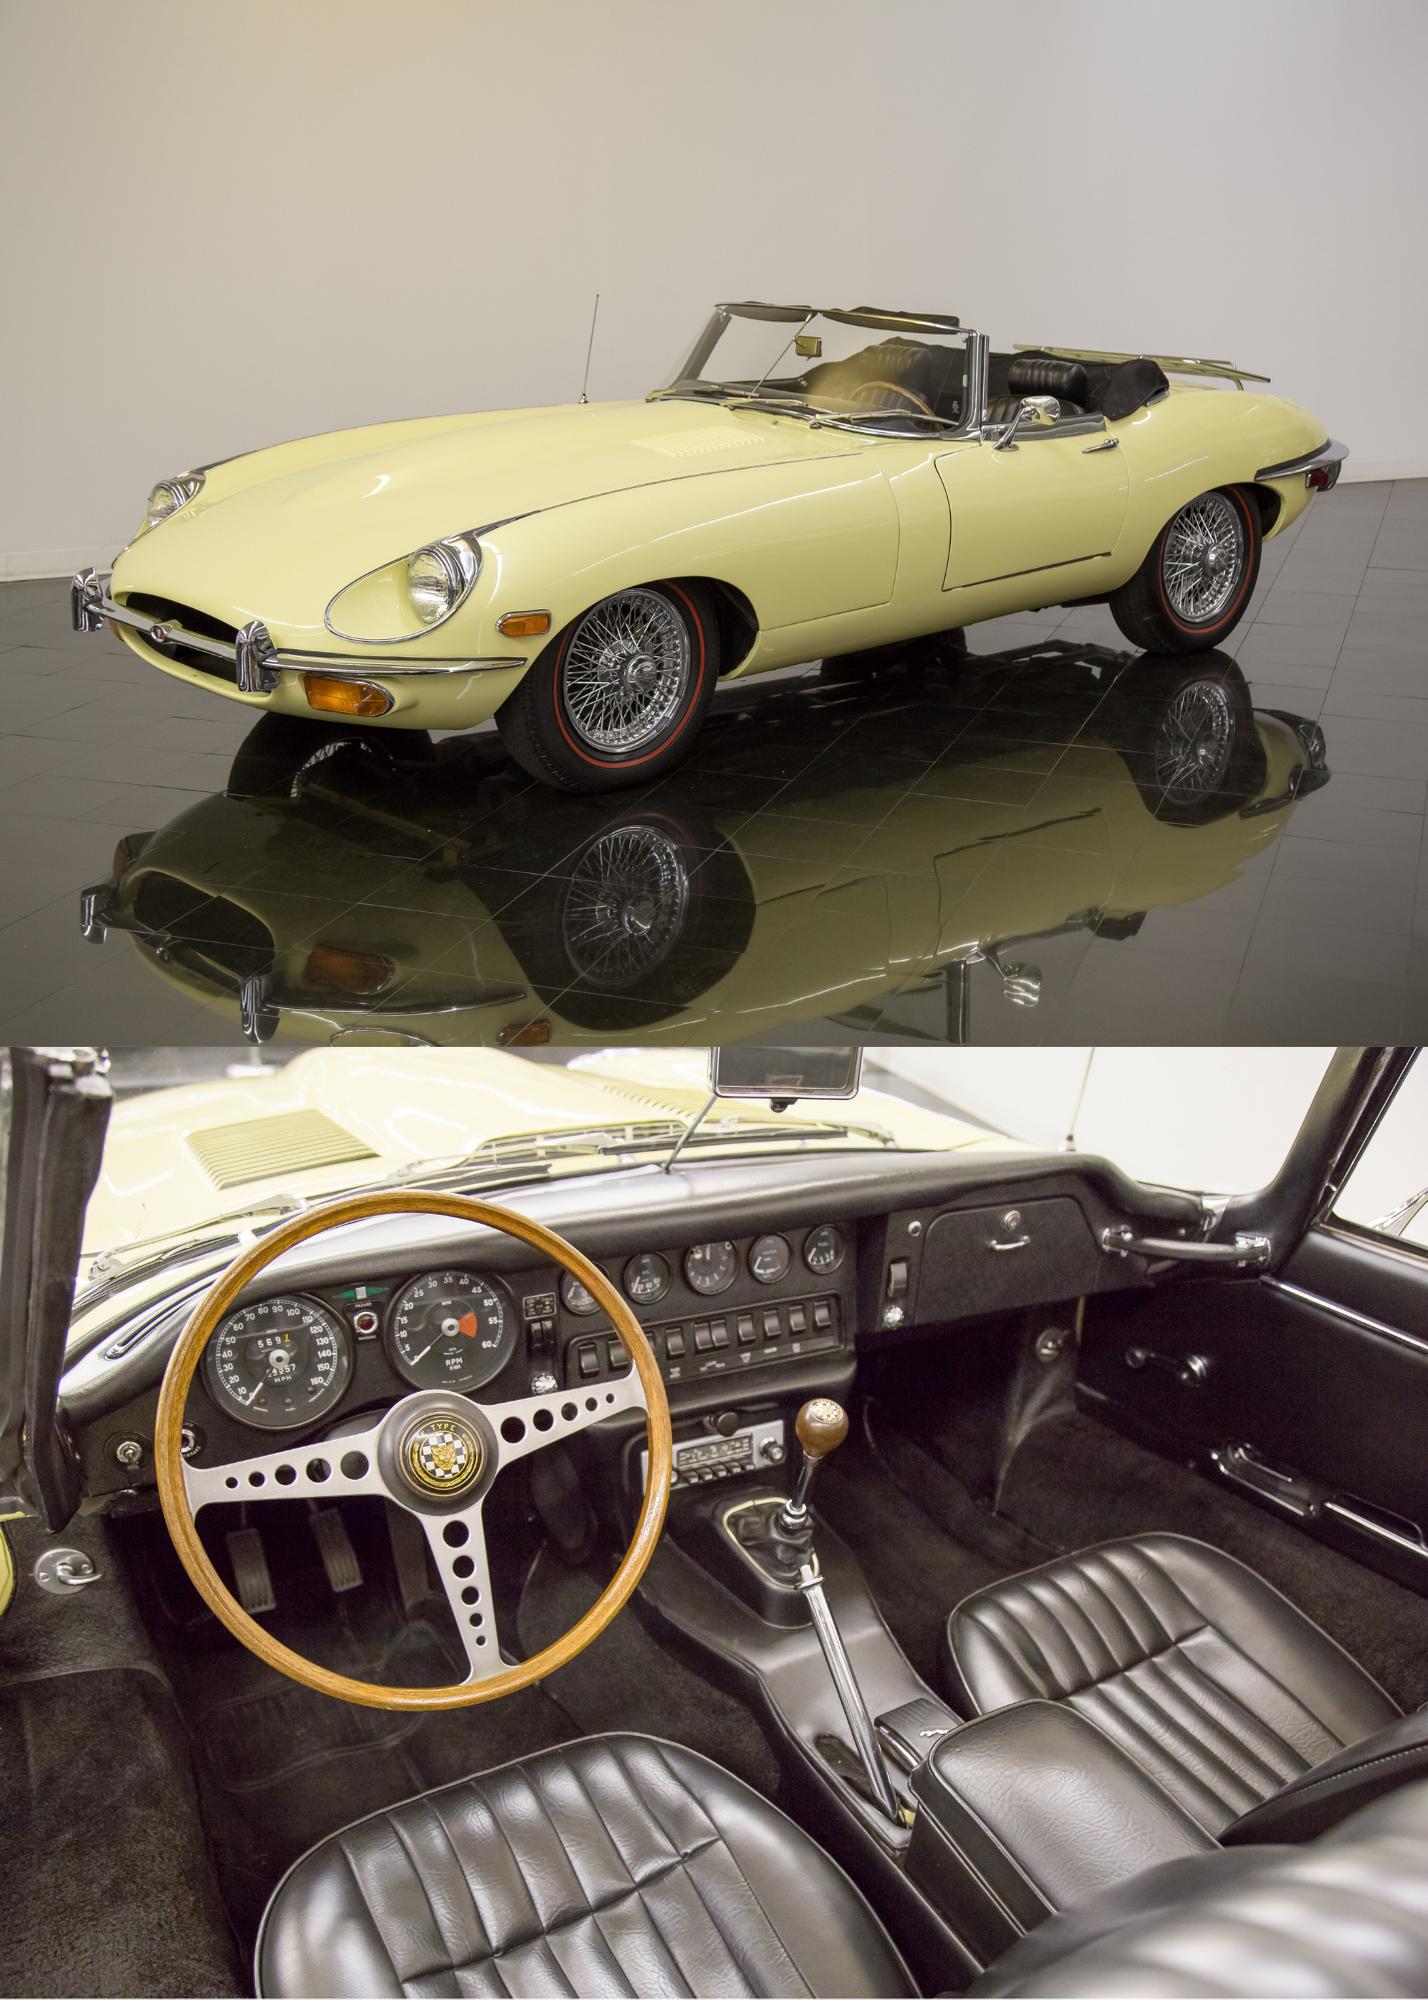 1969 Jaguar E-Type Series II Convertible